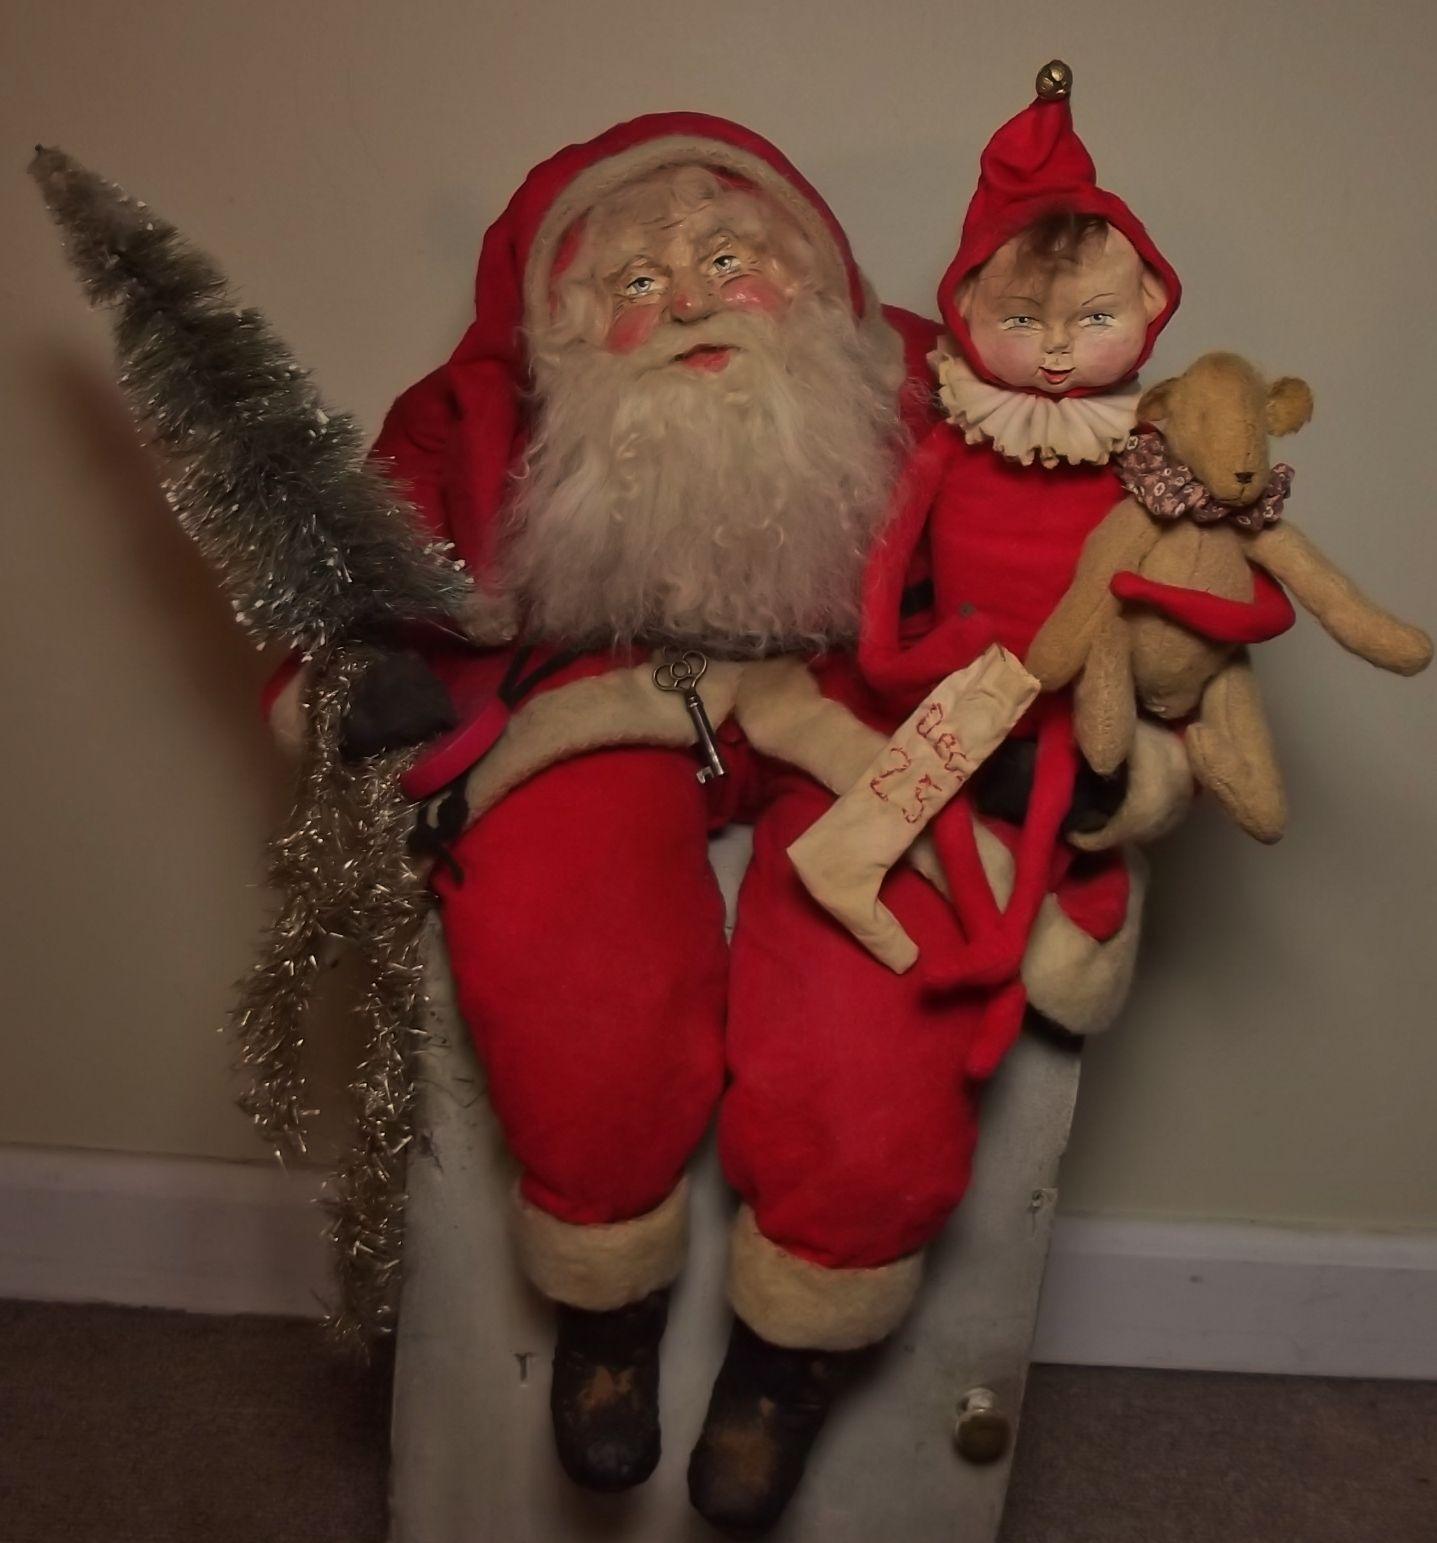 Handmade Santa Claus ~Elf & Bear By Kim Sweet~Kim's Klaus~Ooak Vintage Antique Christmas Folk Art Doll